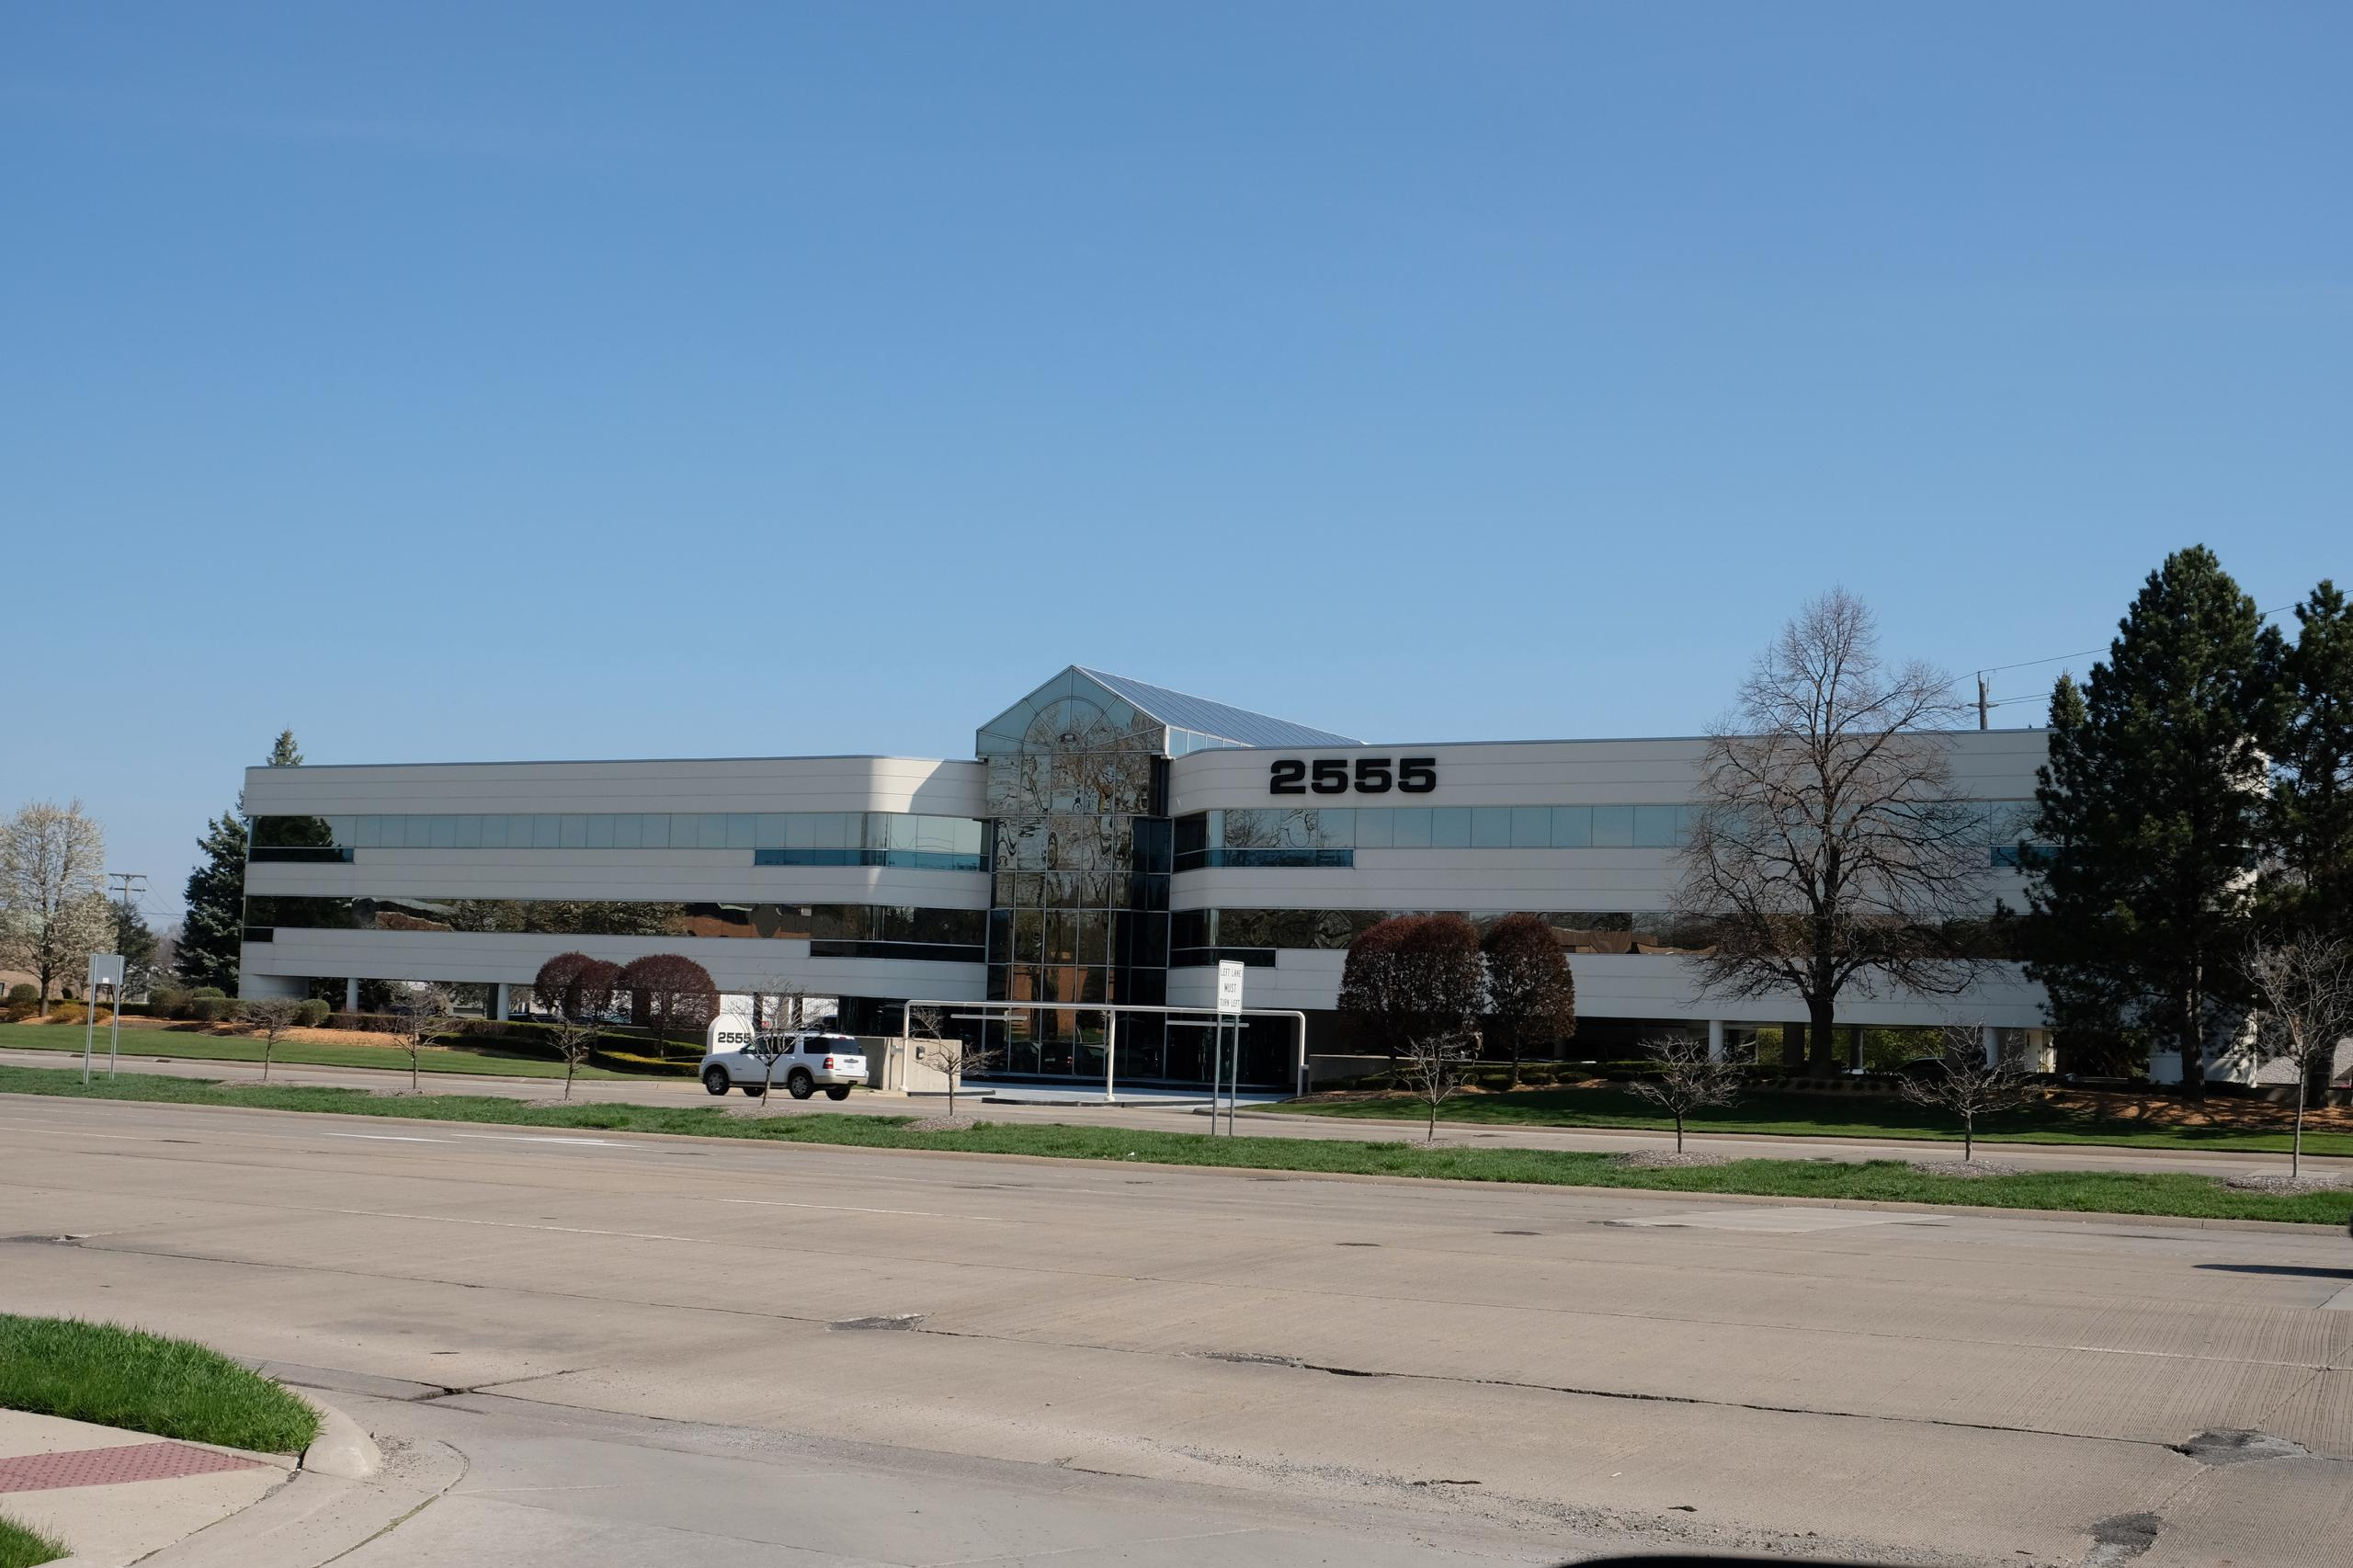 Penske Automotive Group's headquarters in Bloomfield Hills, Michigan.